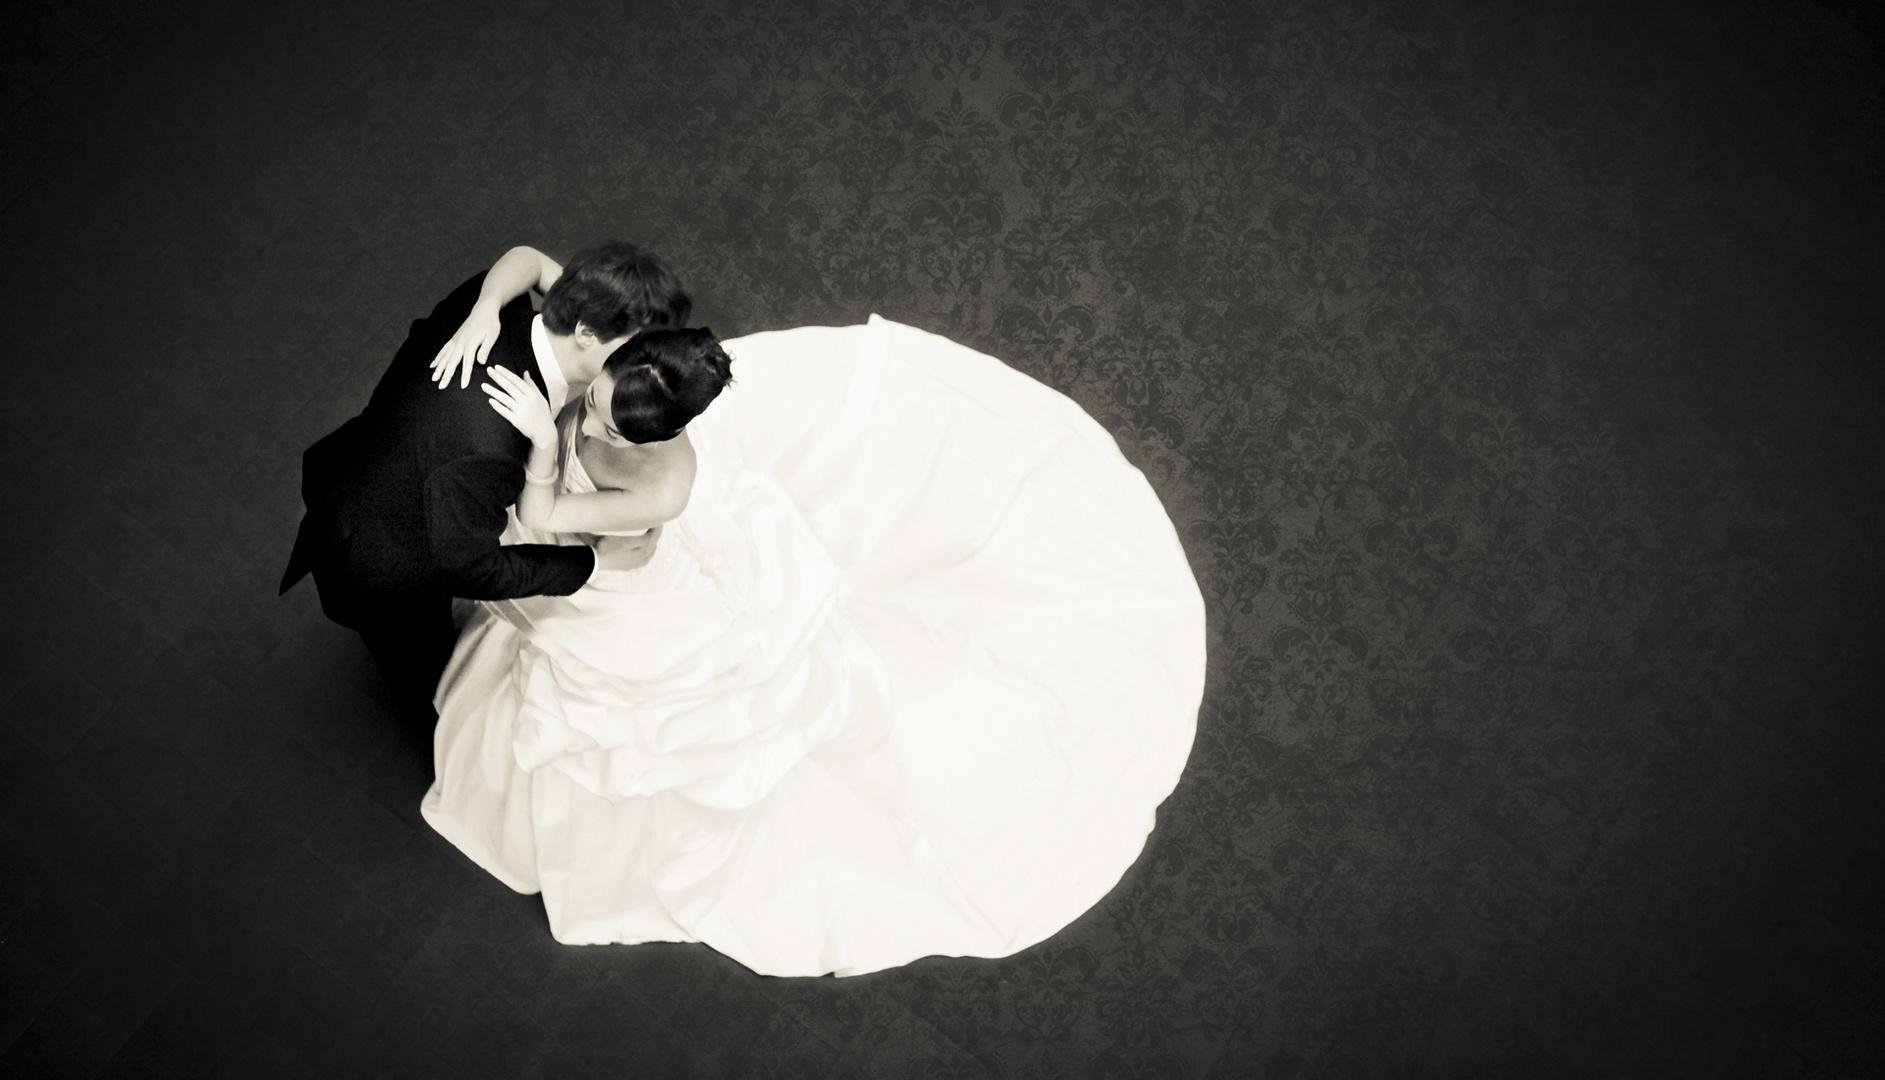 Winter wedding silence 2